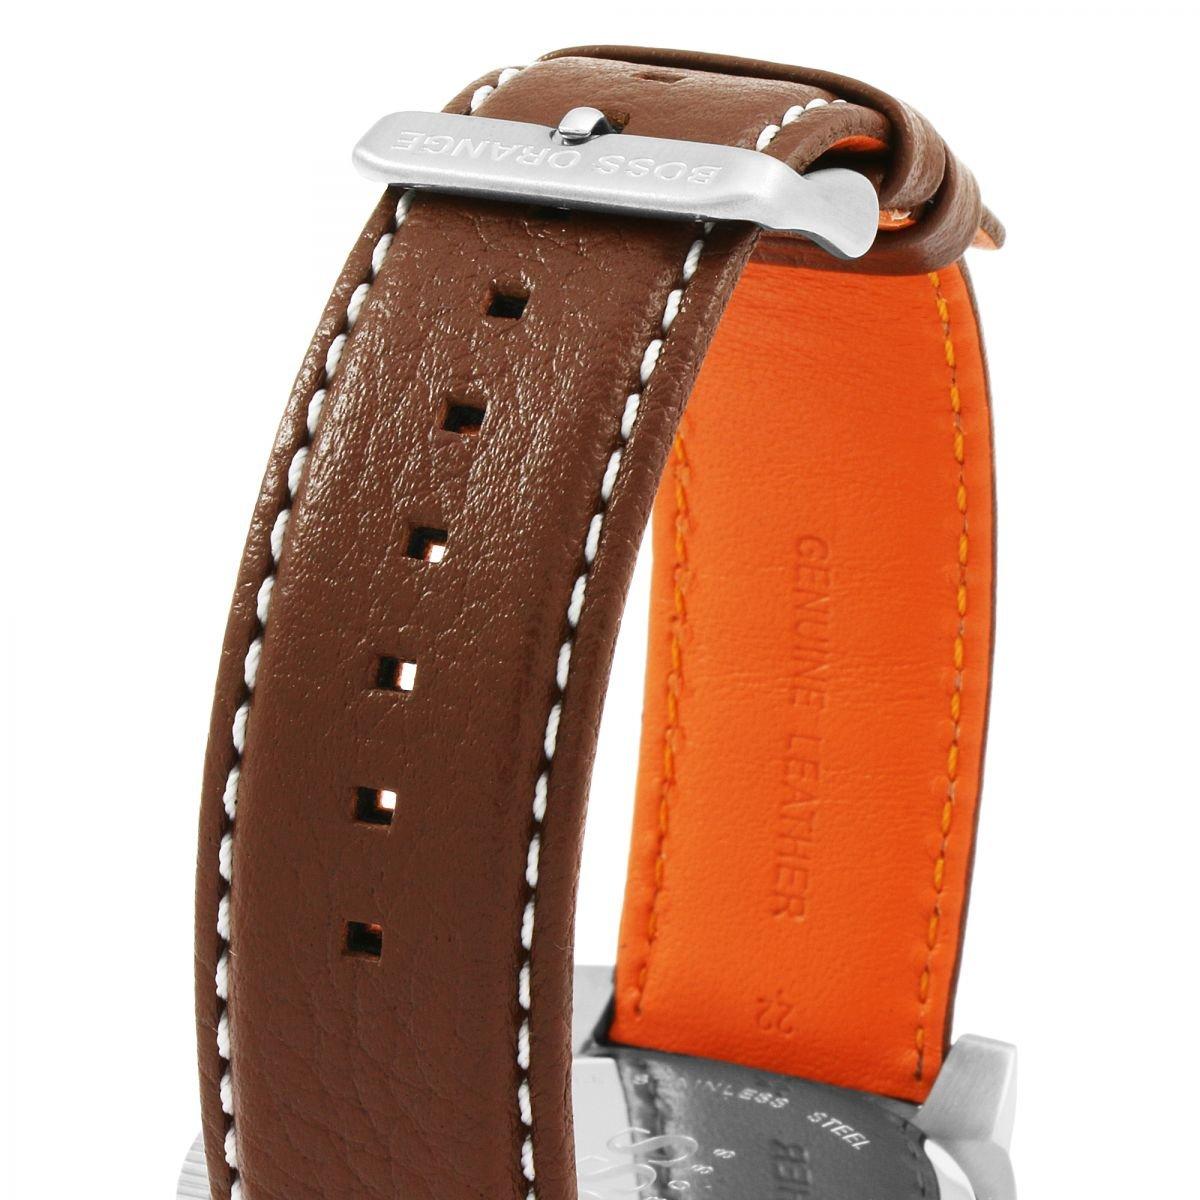 Hugo Boss Orange Mens Watch 1550027  Amazon.co.uk  Watches 729b7dbc05d1